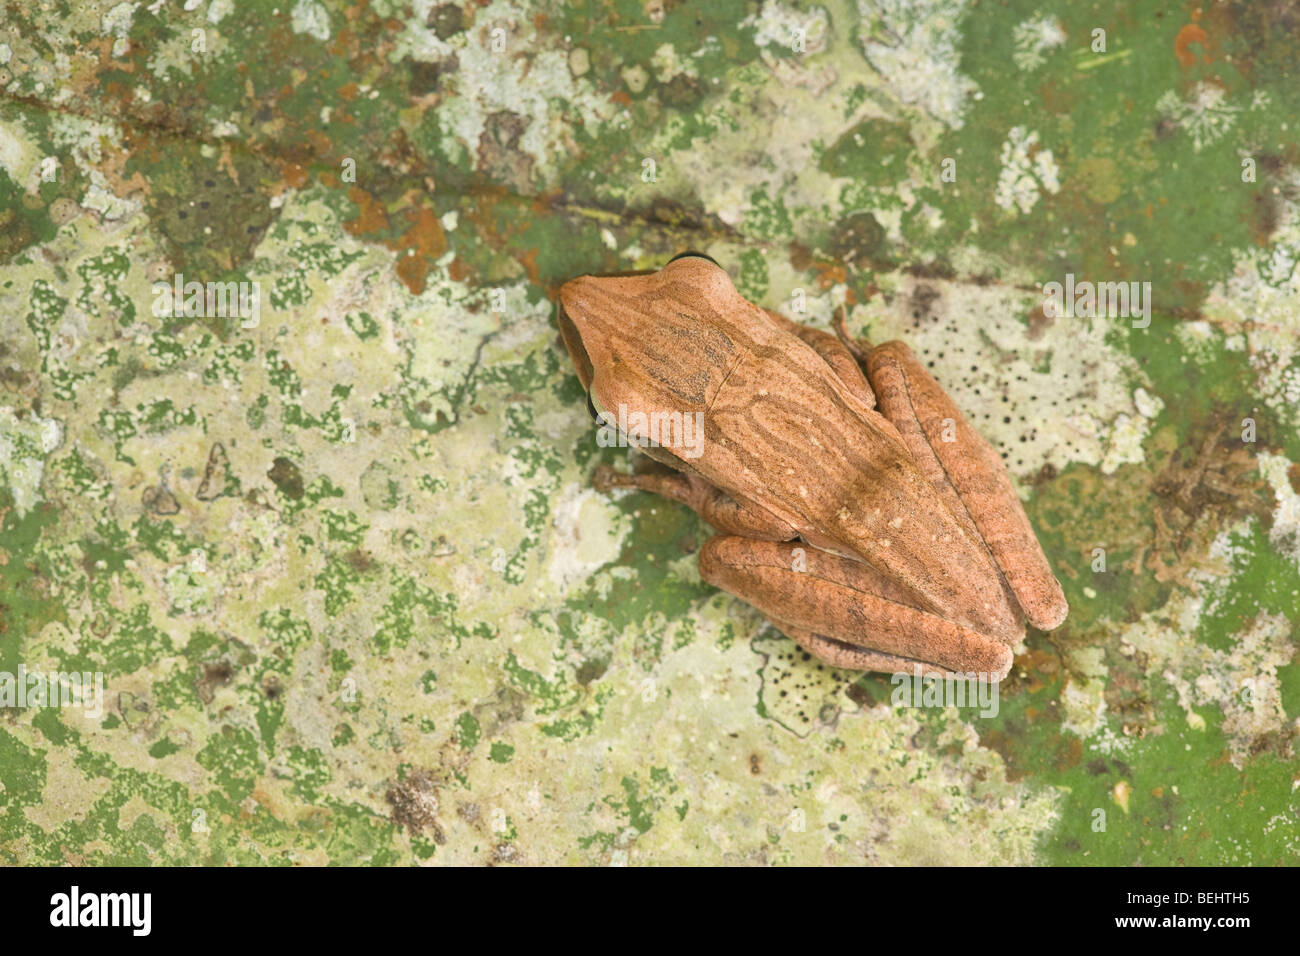 Four-lined Treefrog, Bako National Park Sarawak - Stock Image